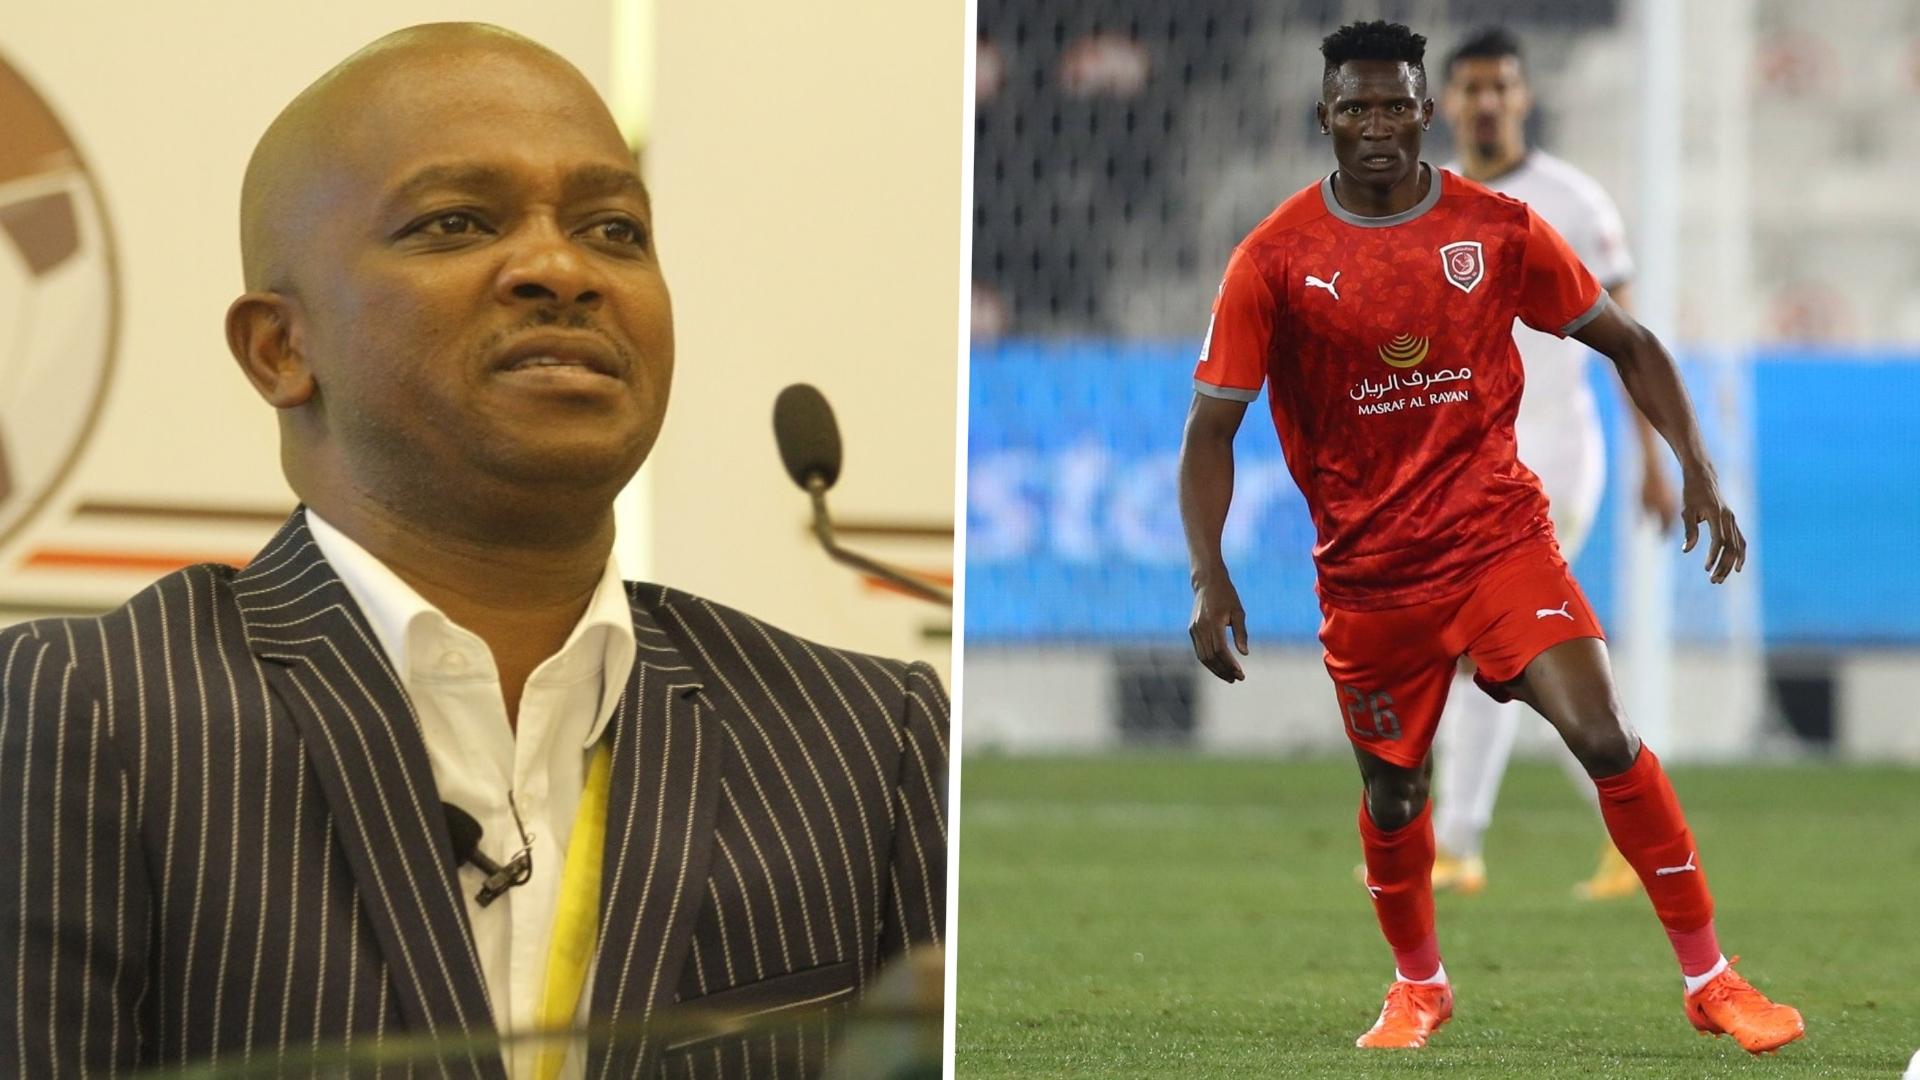 Mwendwa: Olunga made good choice to sign for Al Duhail SC